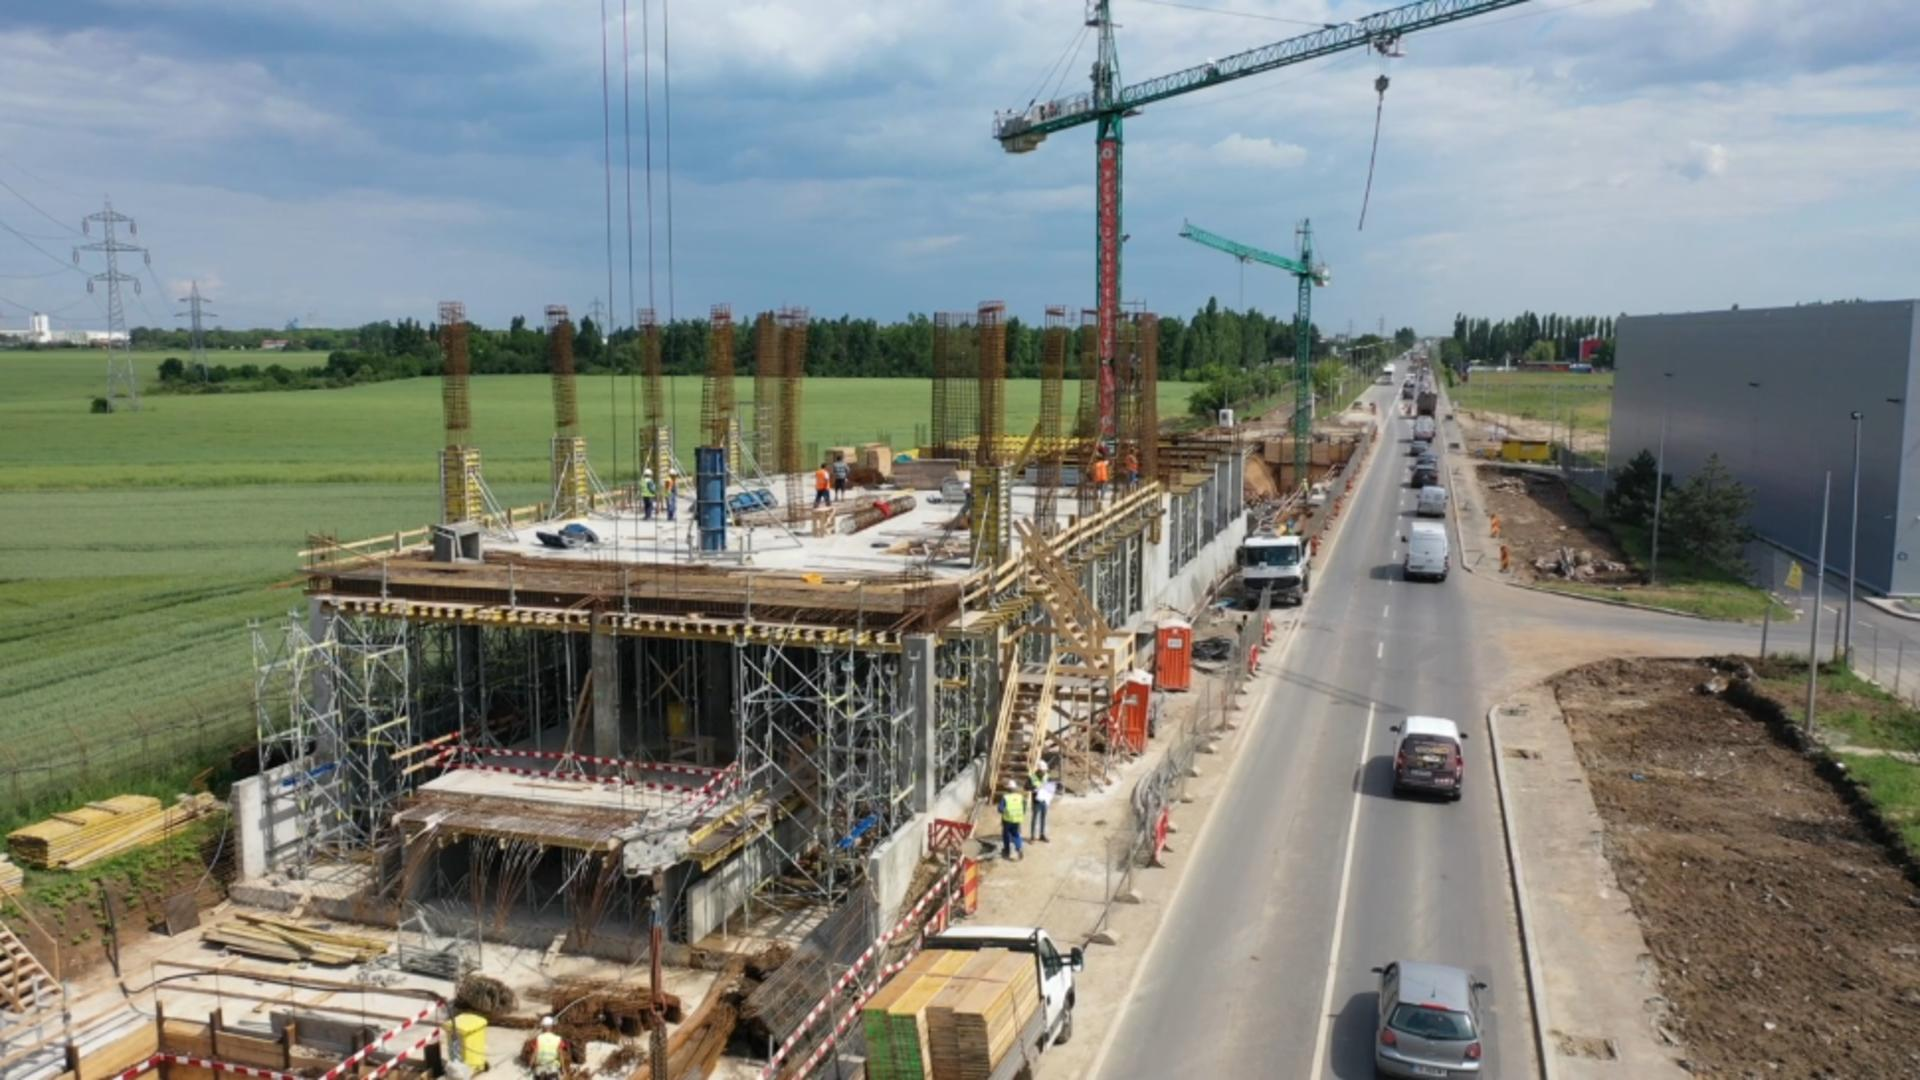 Construcție extindere linie metrou M2 / Foto: Facebook Daniel Băluță